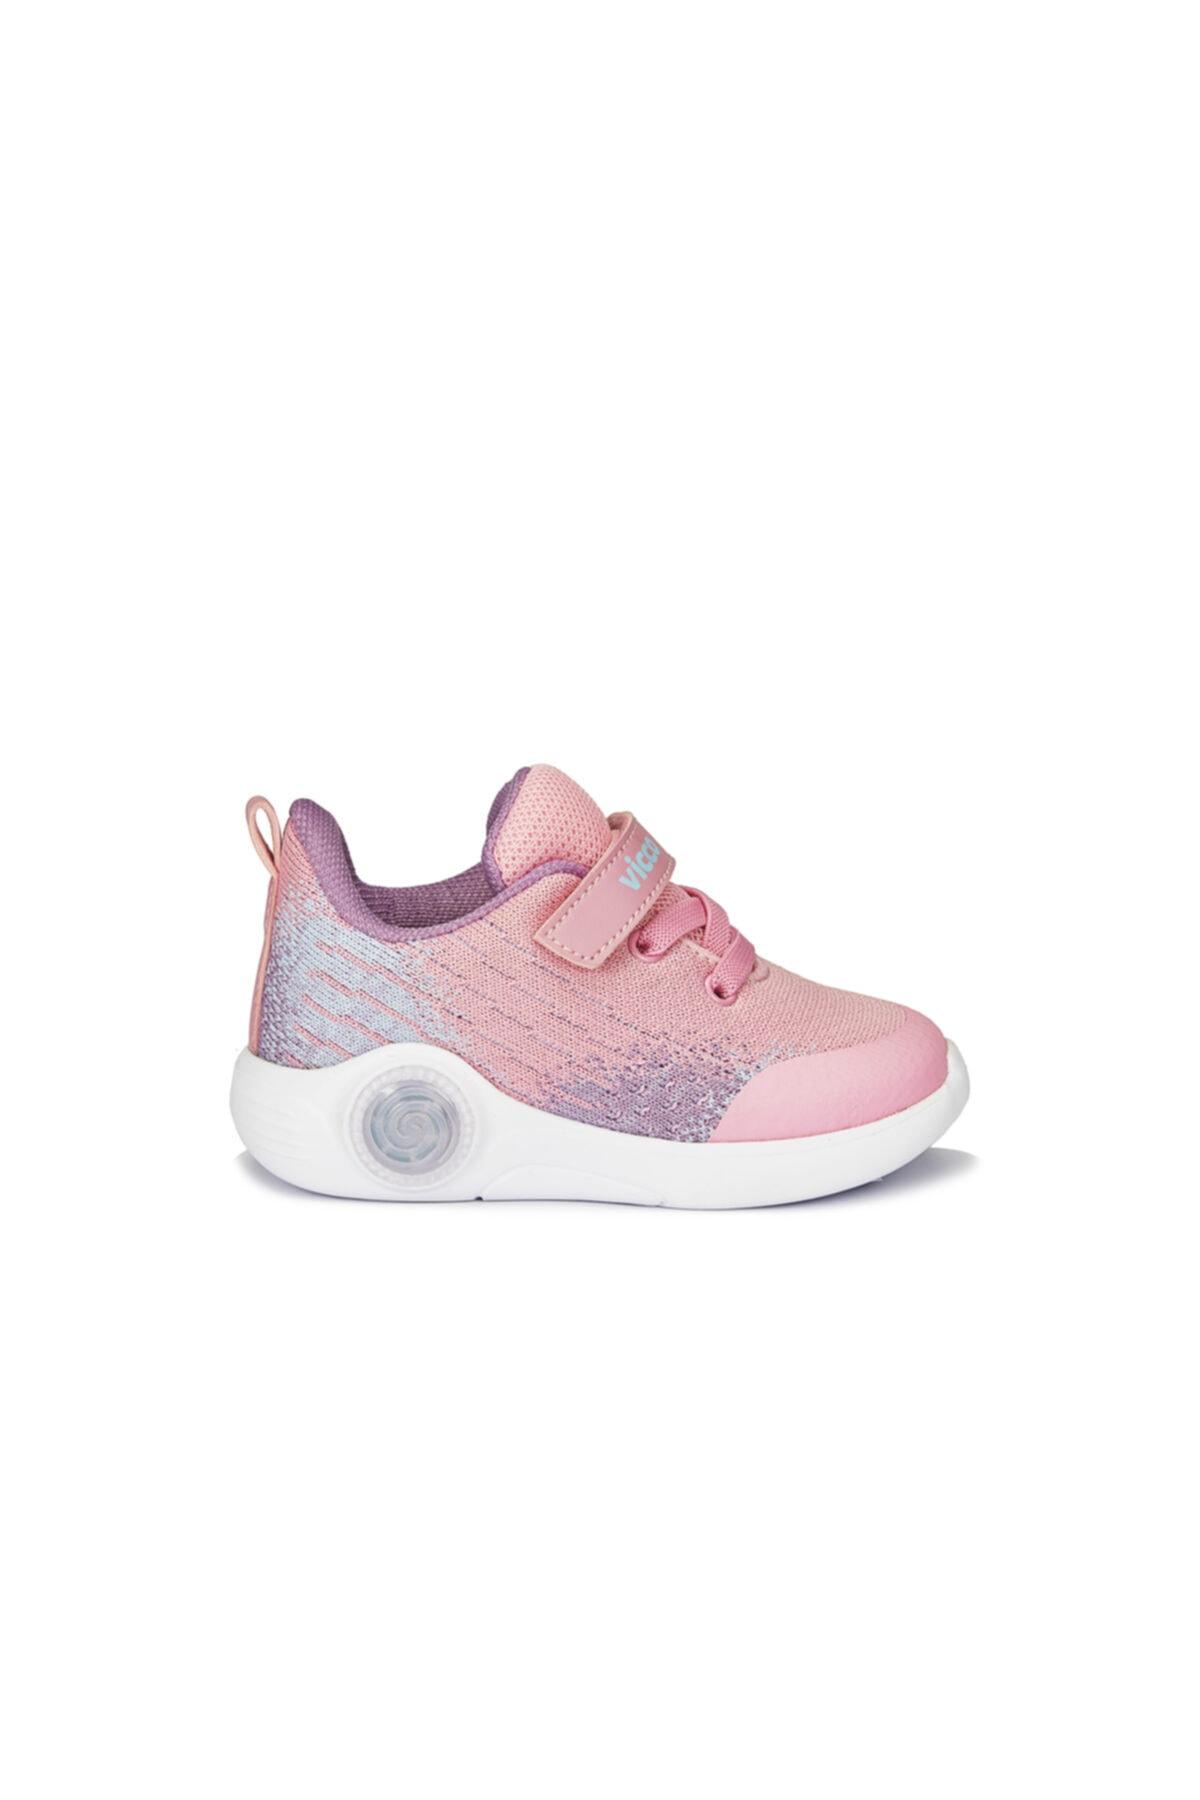 Vicco Kız Bebek Neo Pembe Spor Ayakkabı 2